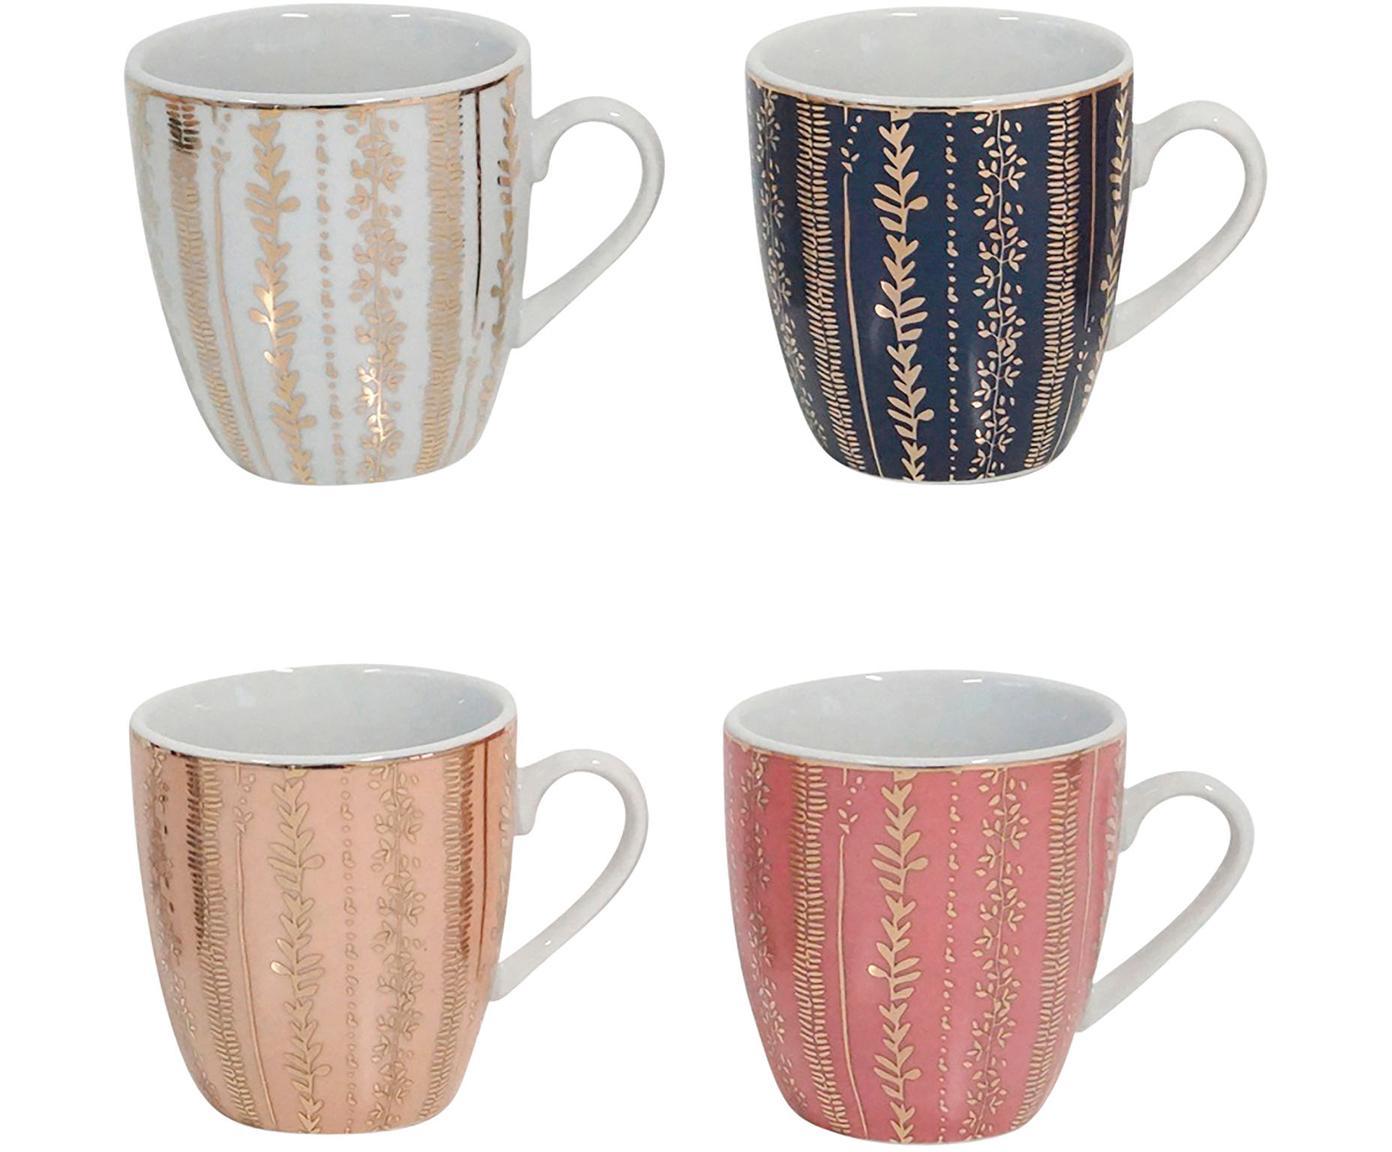 Komplet filiżanek Veg-Gold, 4 elem., Porcelana, Blady różowy, niebieski, Ø 7 x W 8 cm